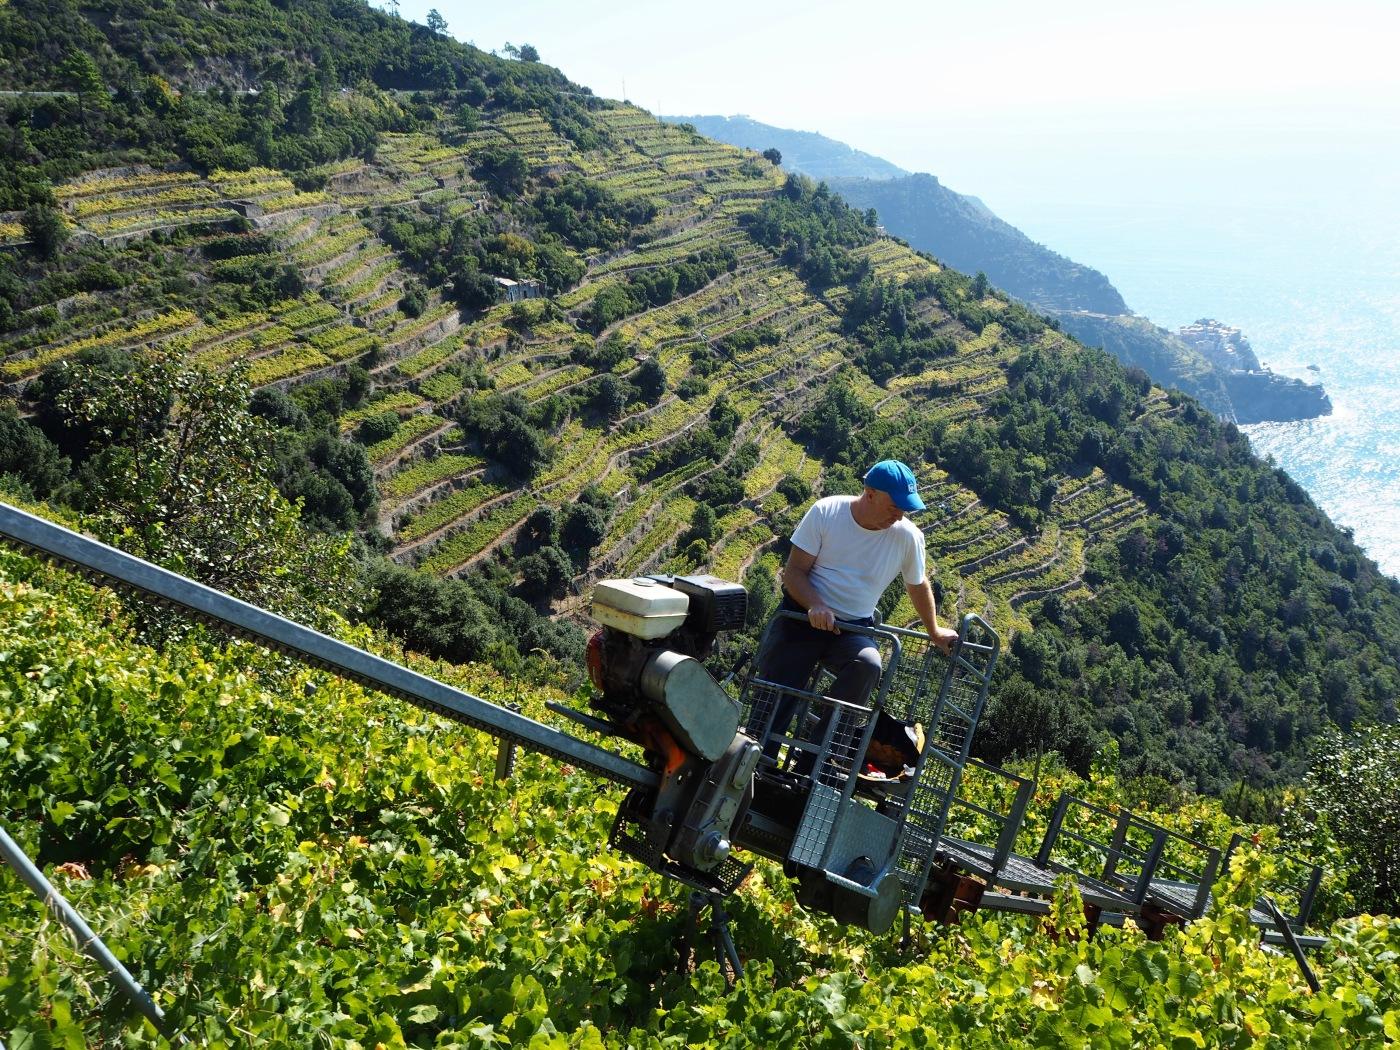 vineyard monorail cinque terre